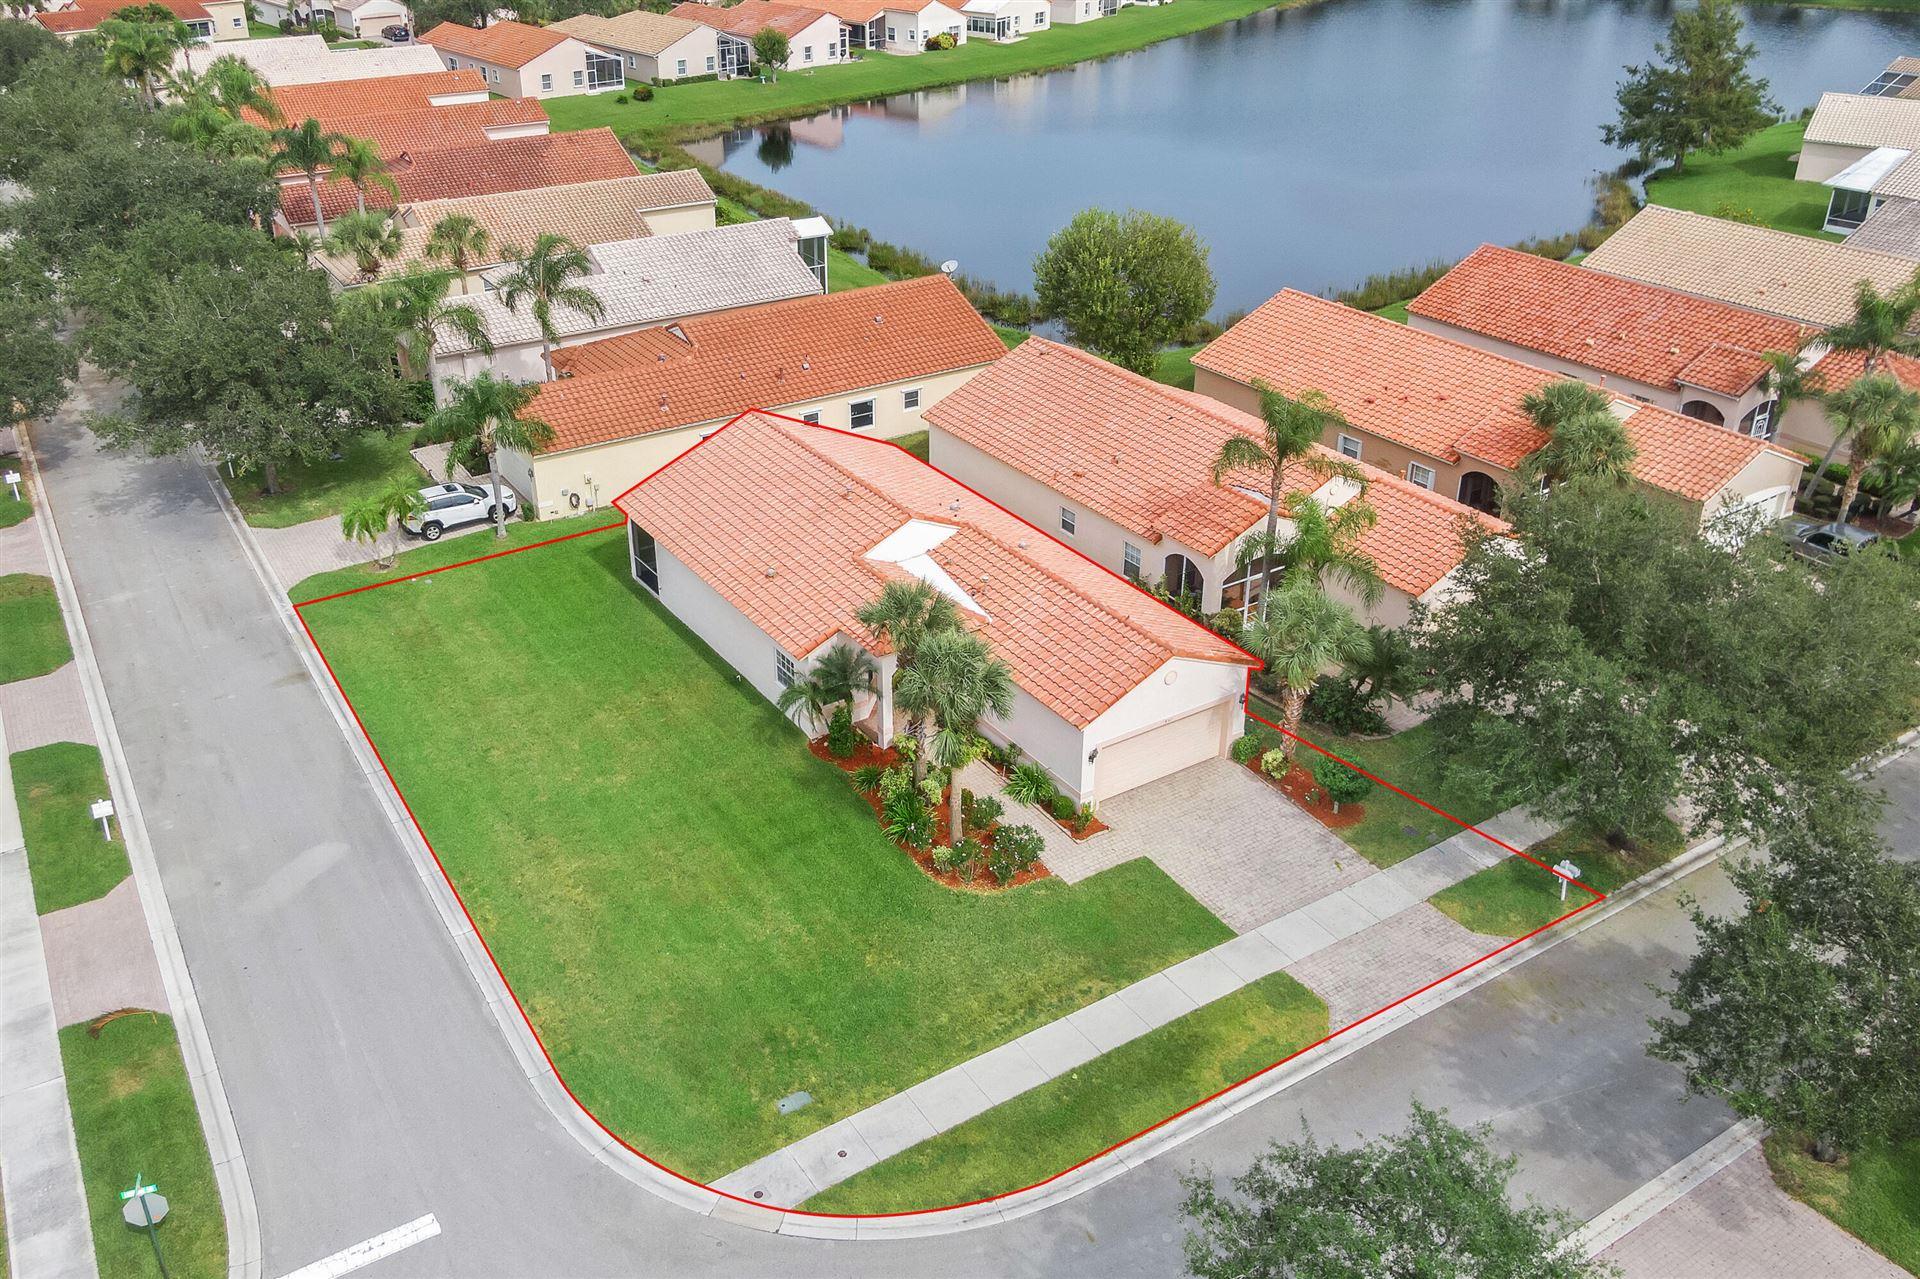 Photo of 450 NW Lismore Lane, Port Saint Lucie, FL 34986 (MLS # RX-10754627)